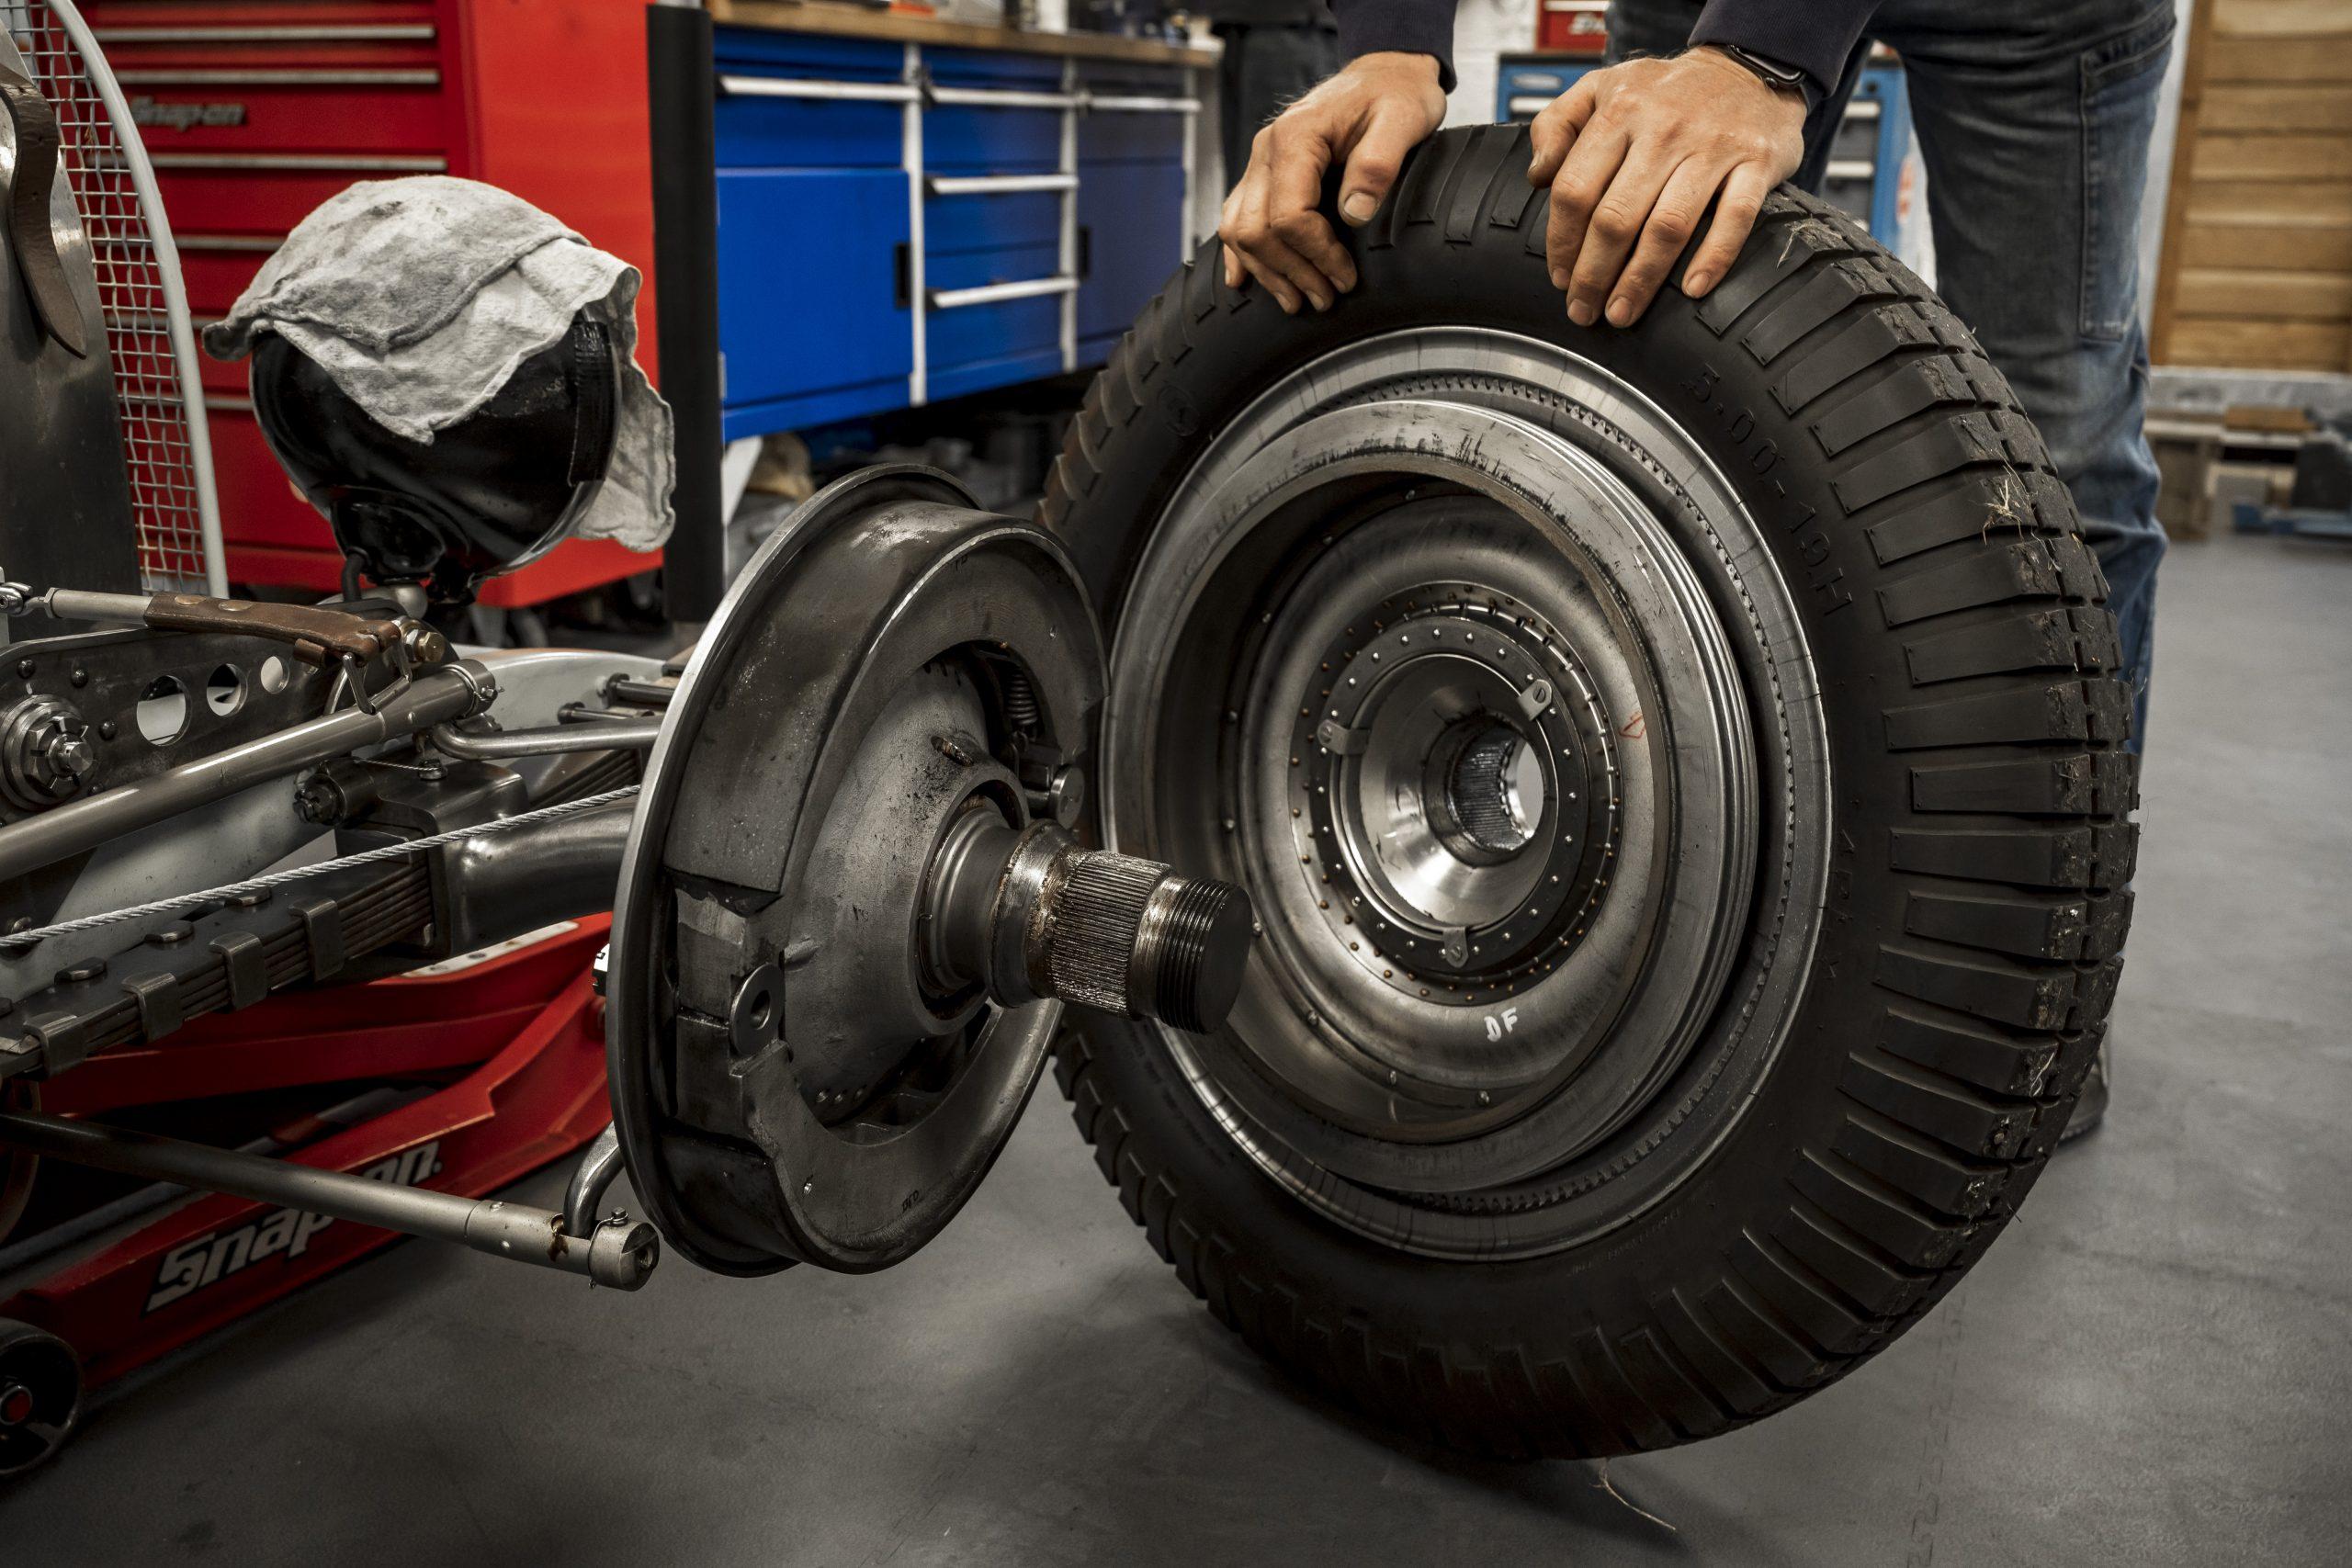 Tula Precision wheel and hub detail